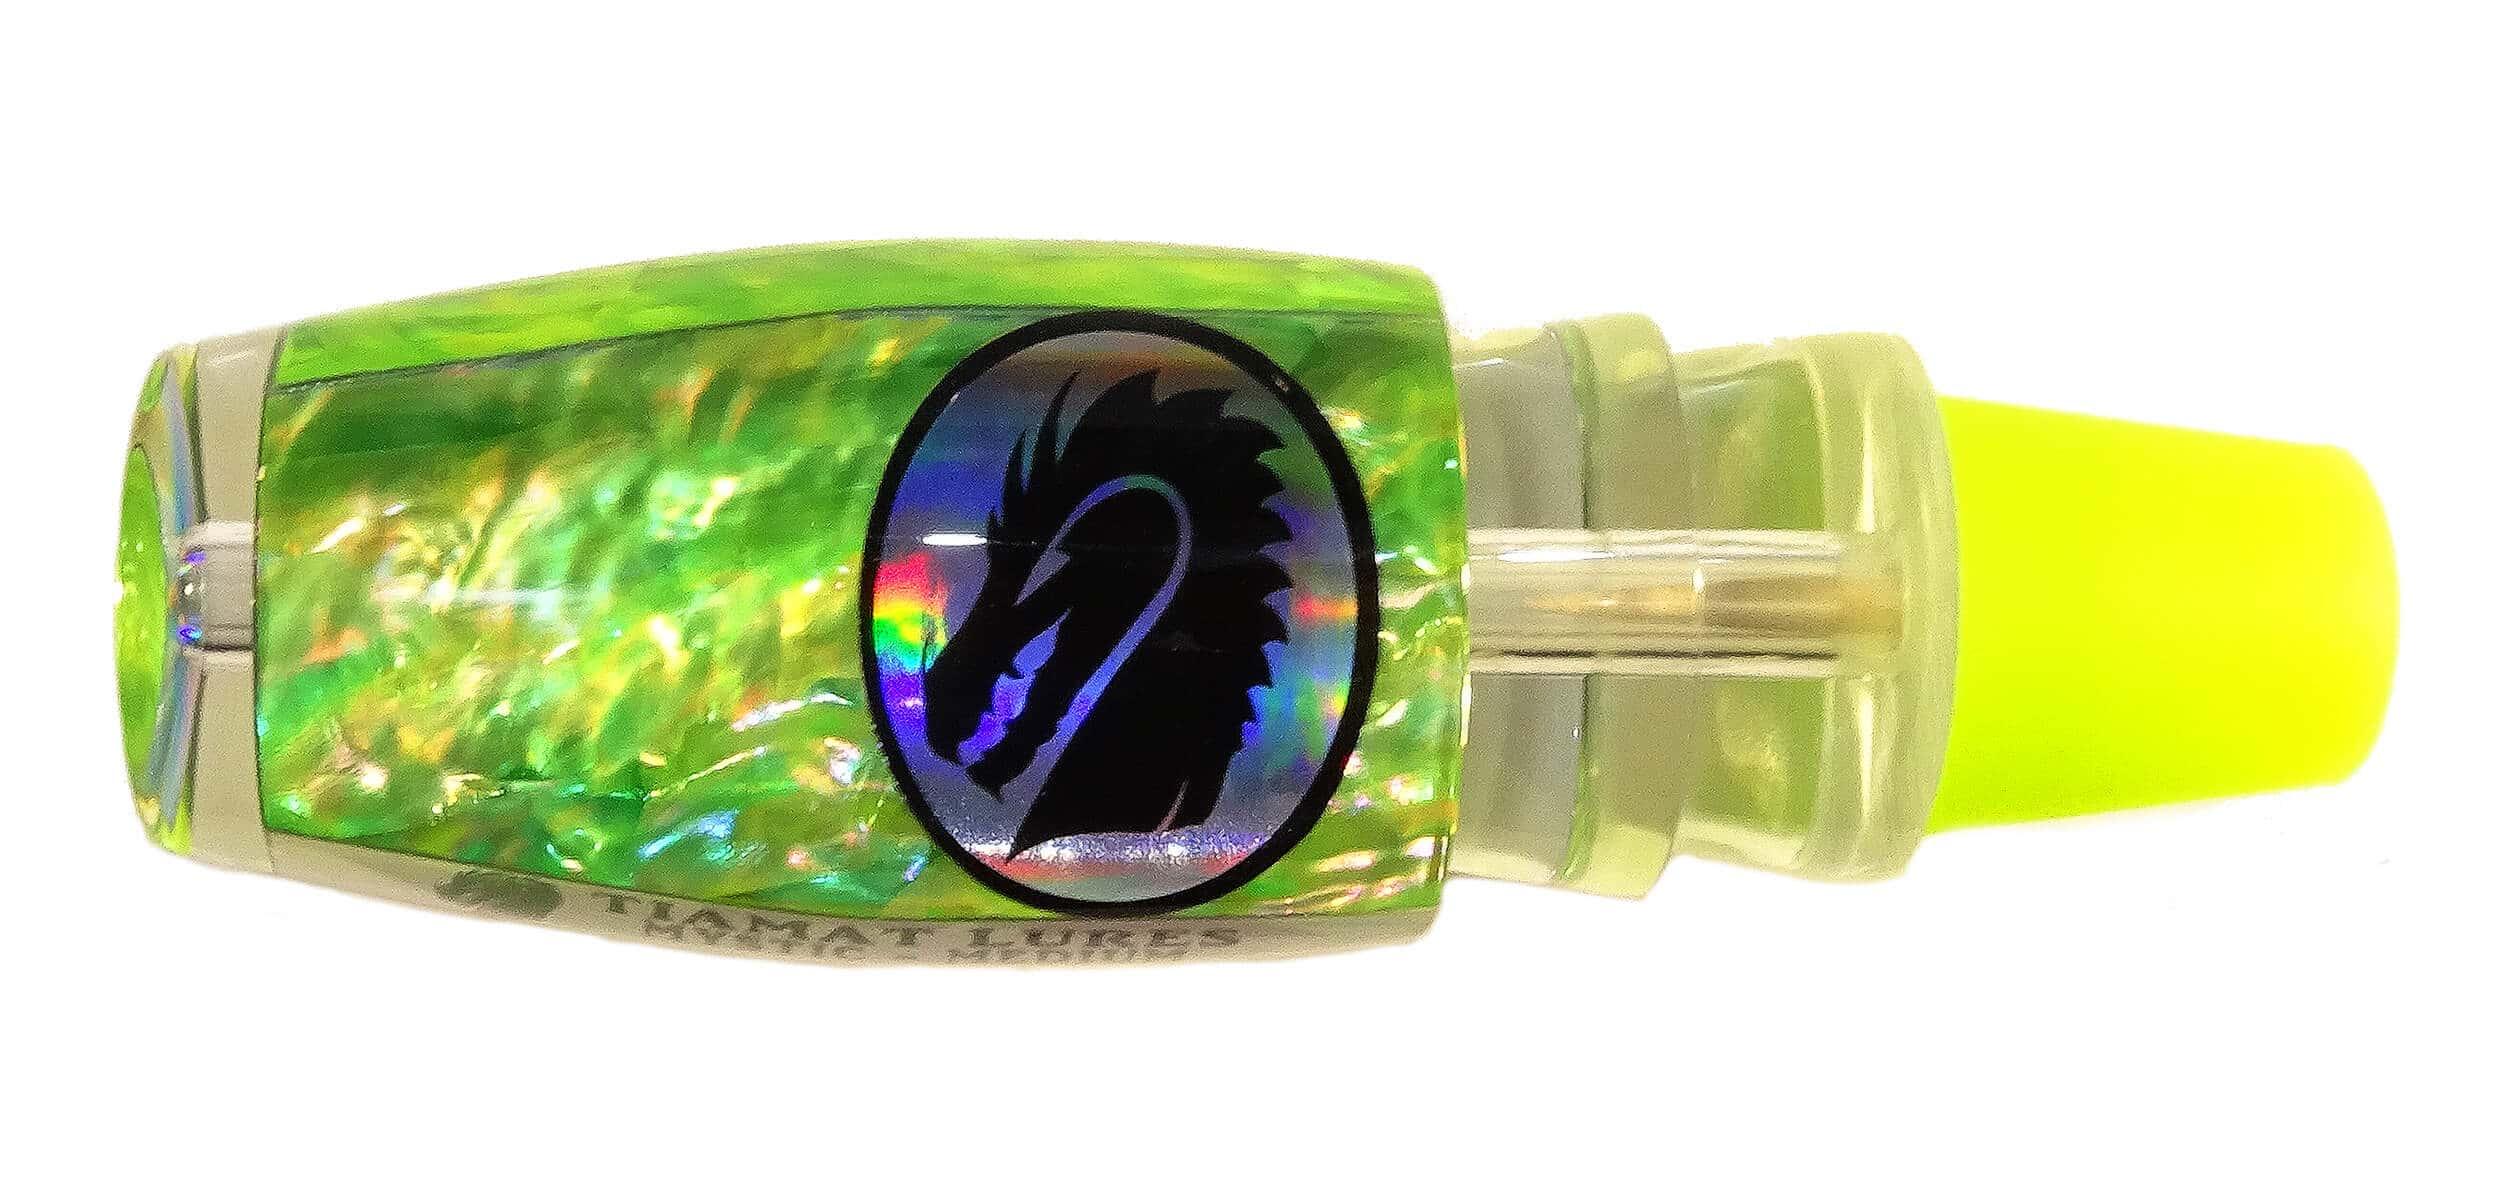 Tiamat Lures - Mystic Series - Head - Japanese Chartreuse Awabi Shell